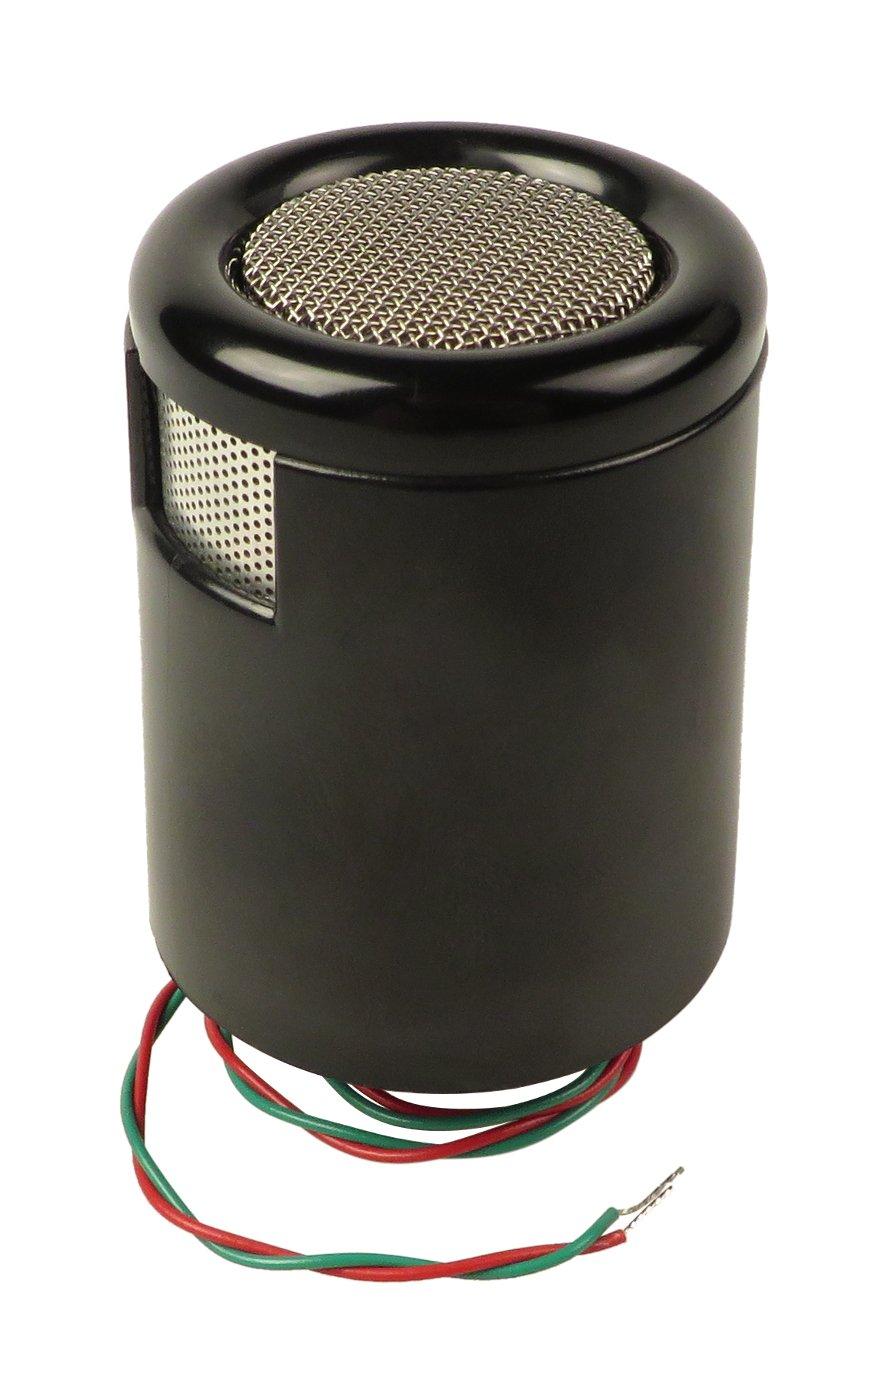 electro voice f 01u 153 875 us622l mic element full compass. Black Bedroom Furniture Sets. Home Design Ideas